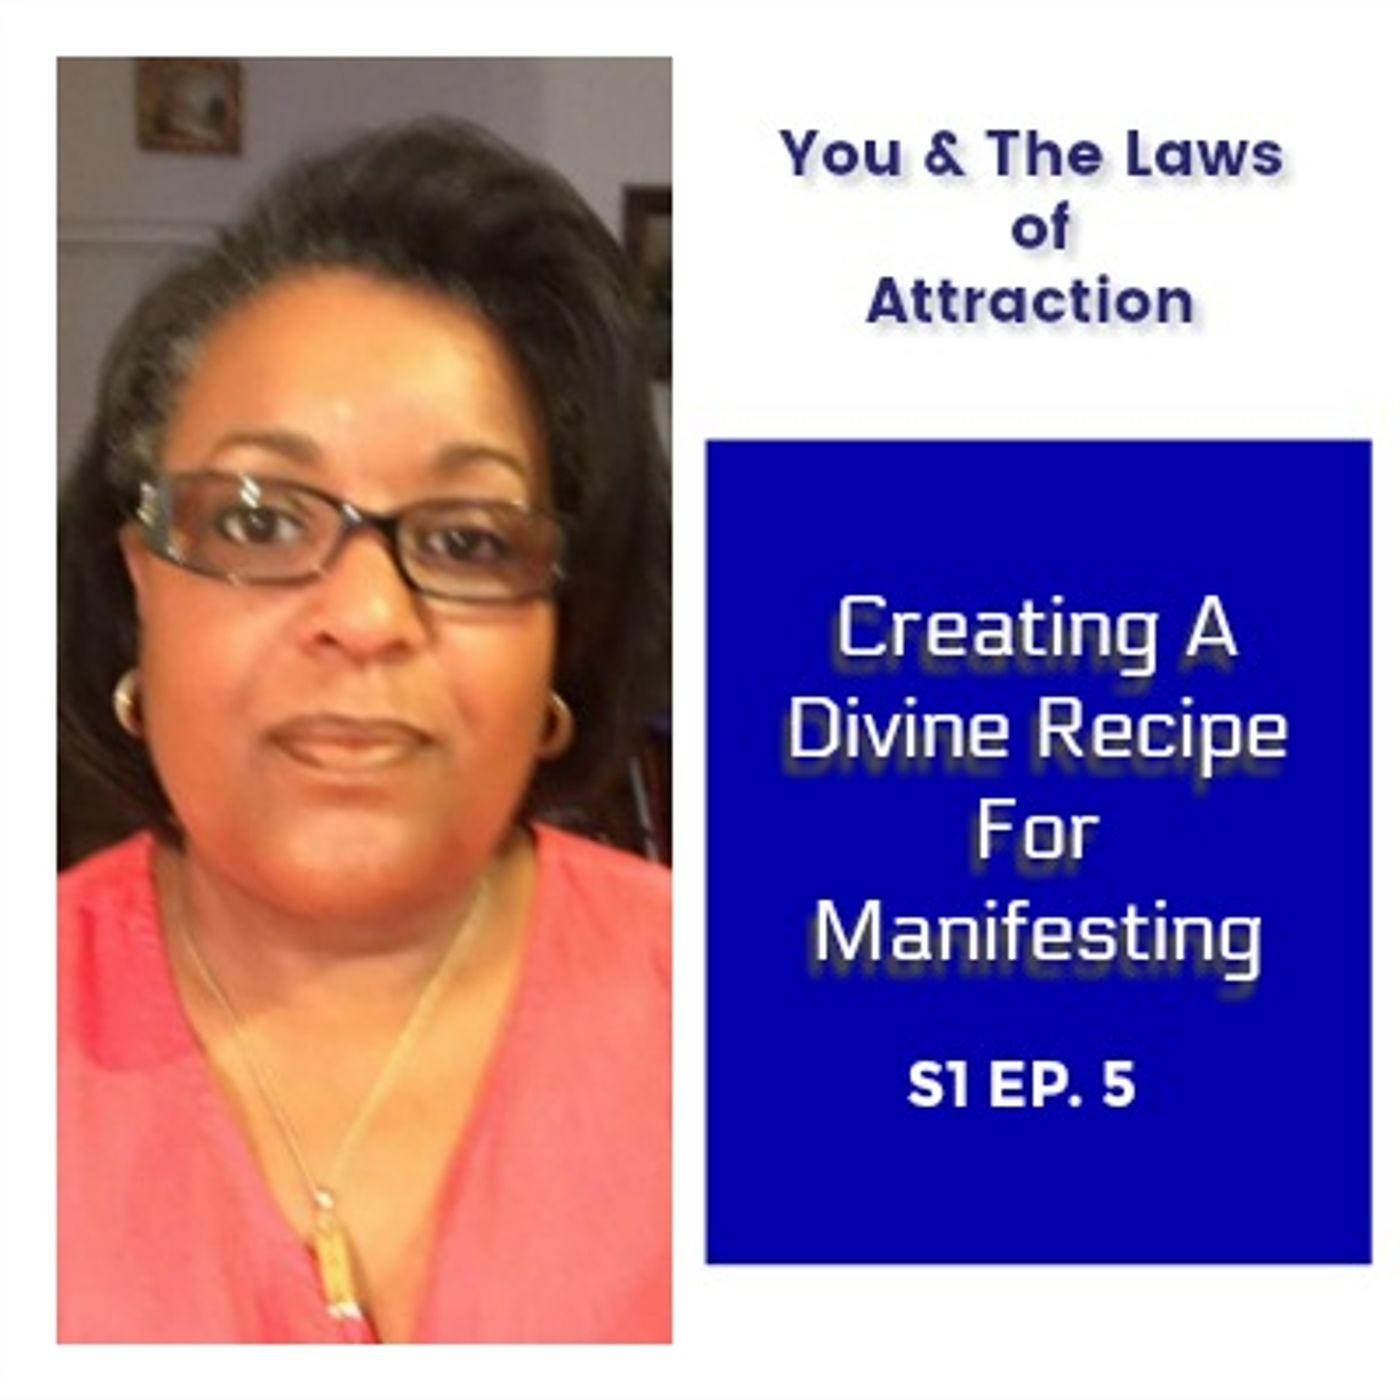 Creating A Divine Recipe For Manifesting